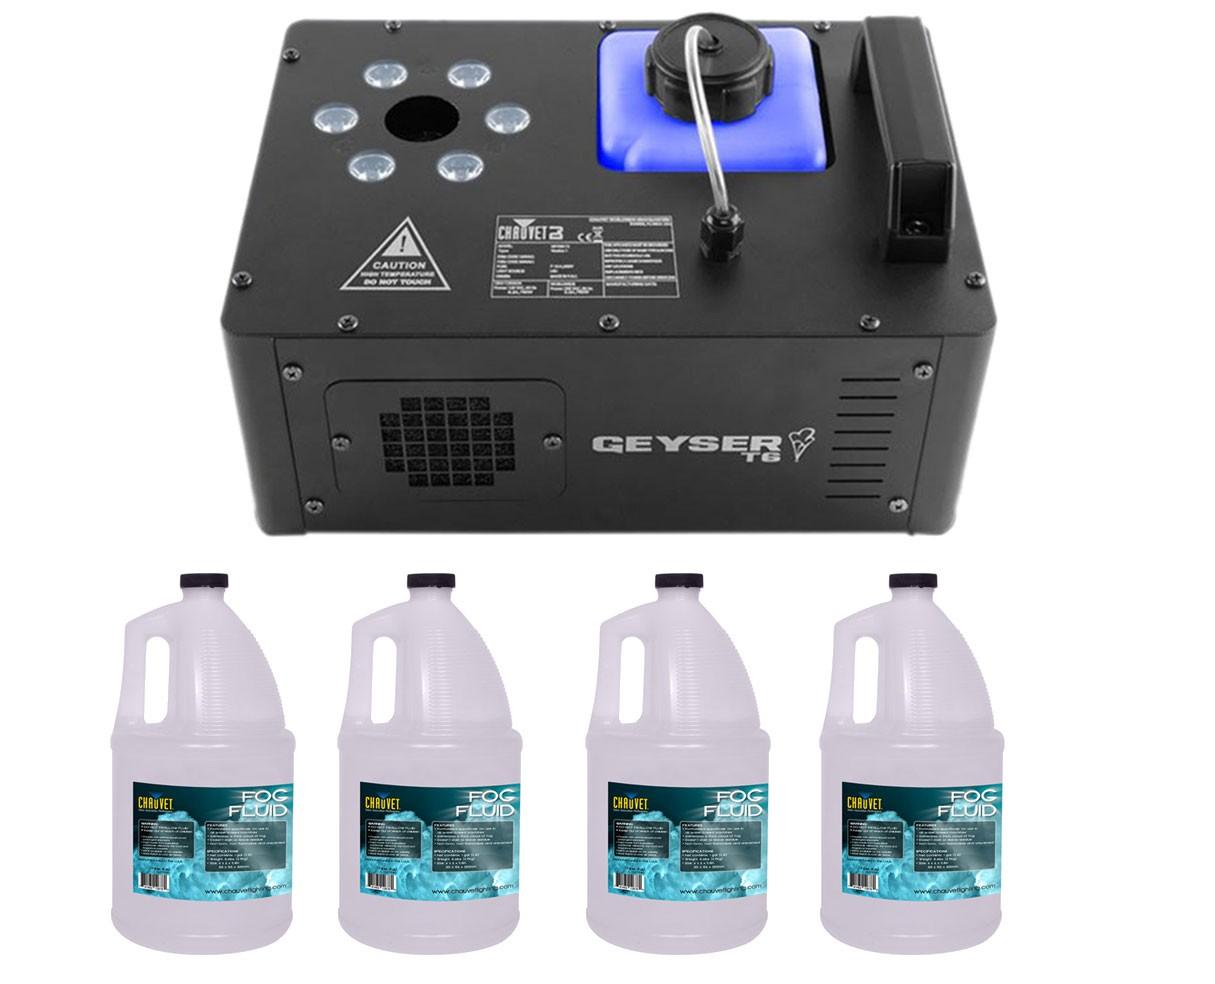 CHAUVET DJ Geyser T6 + 4x Fog Fluid Gallon